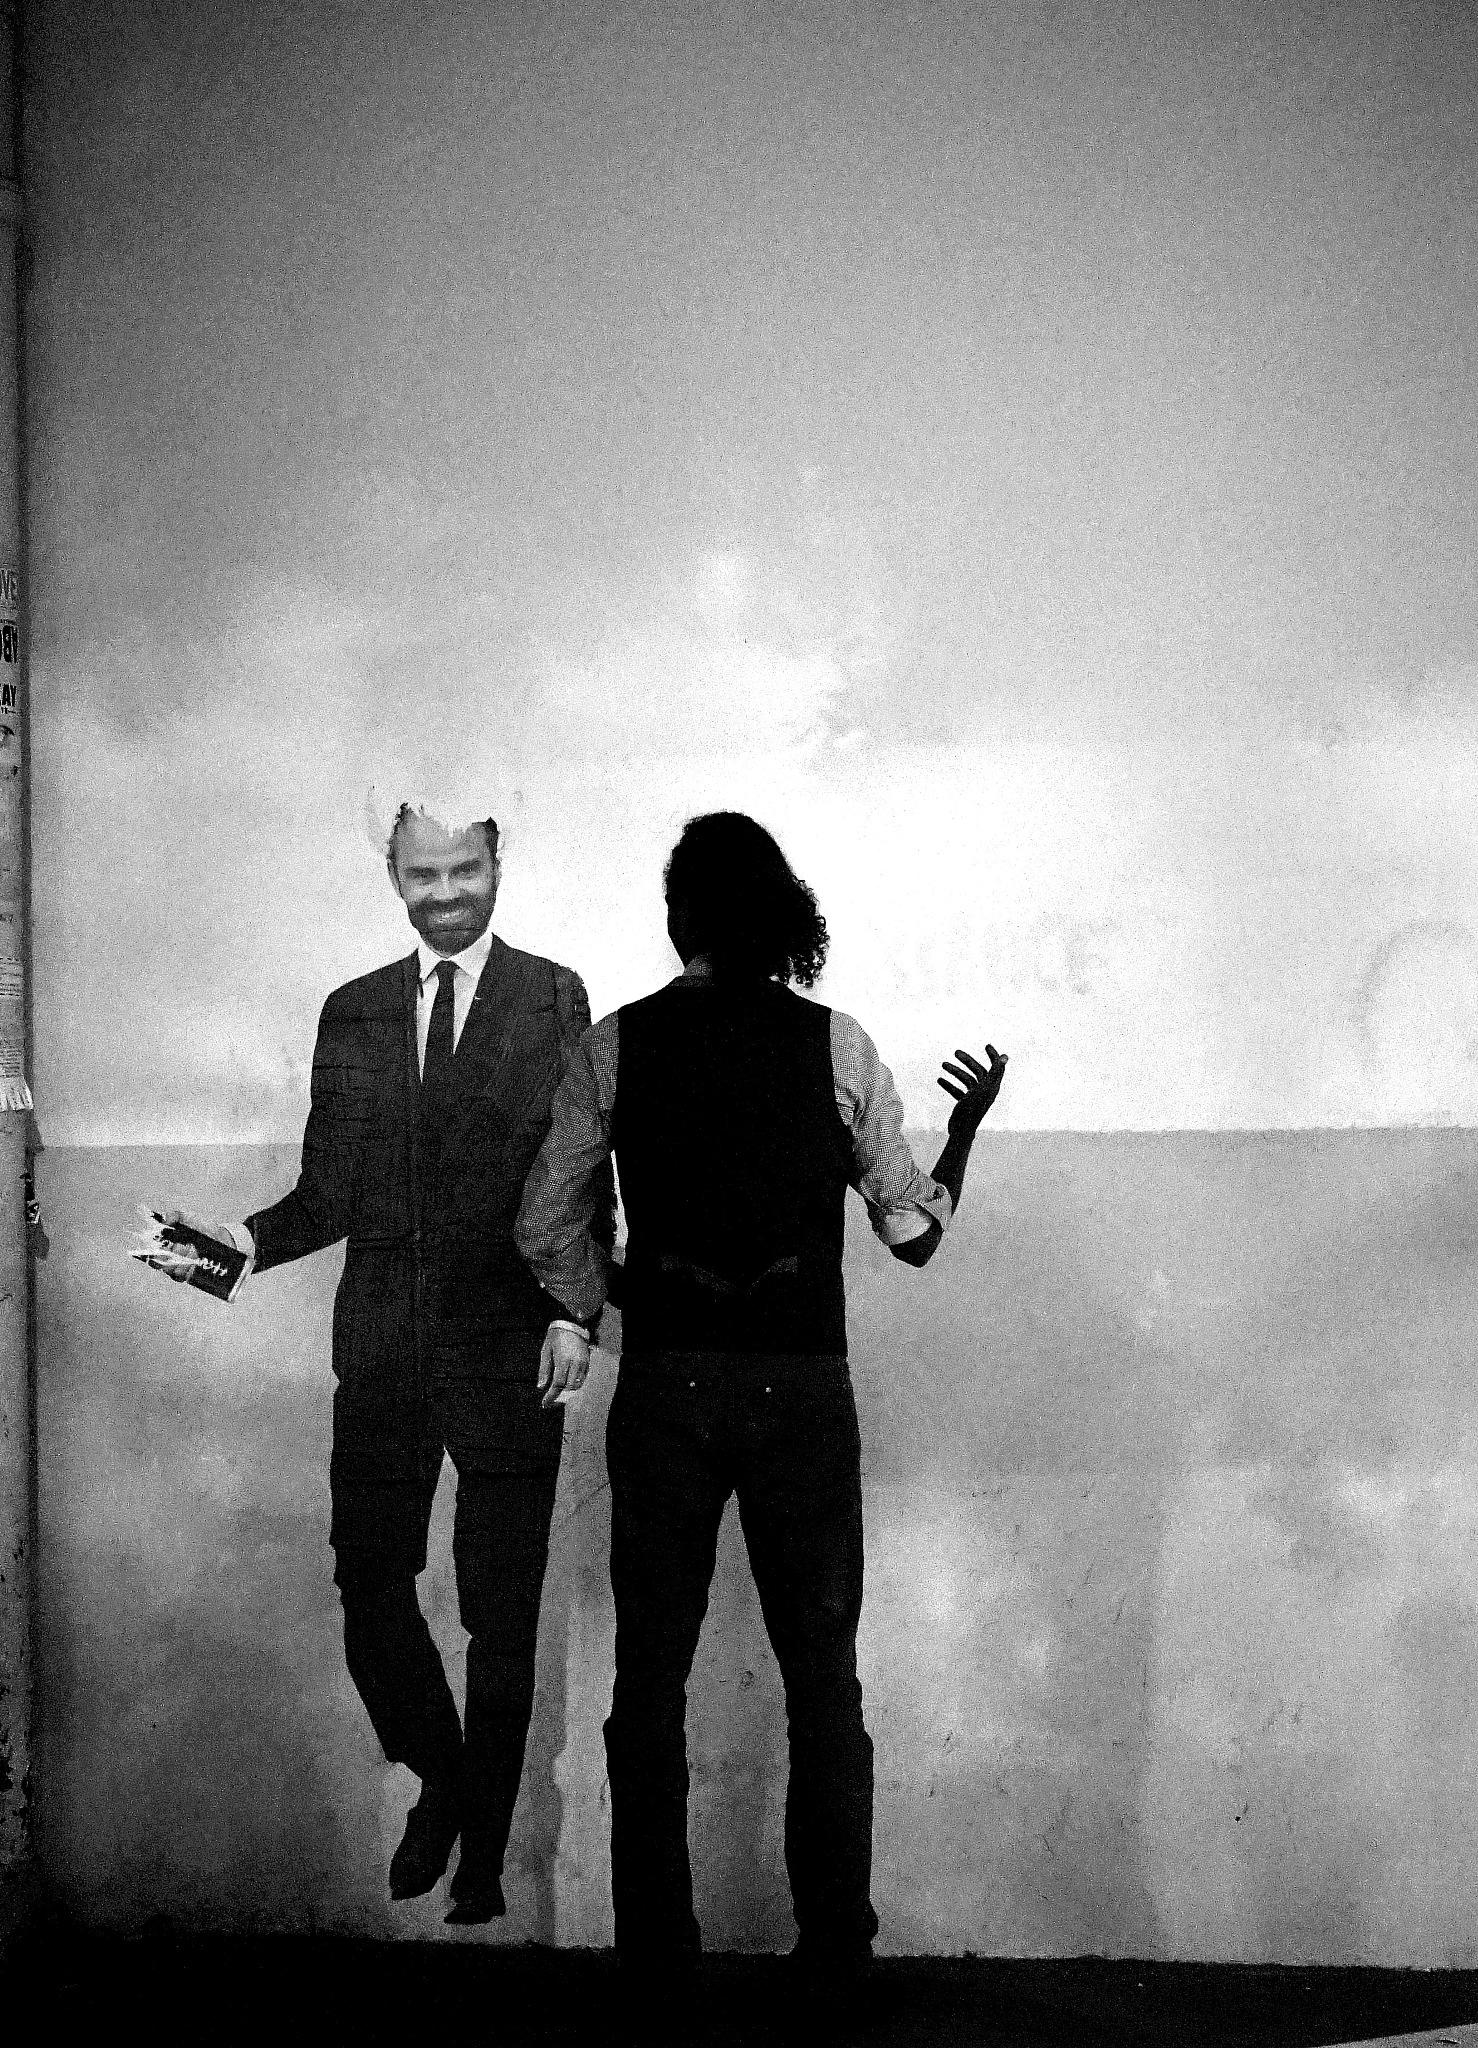 surrealist meeting  by AEM